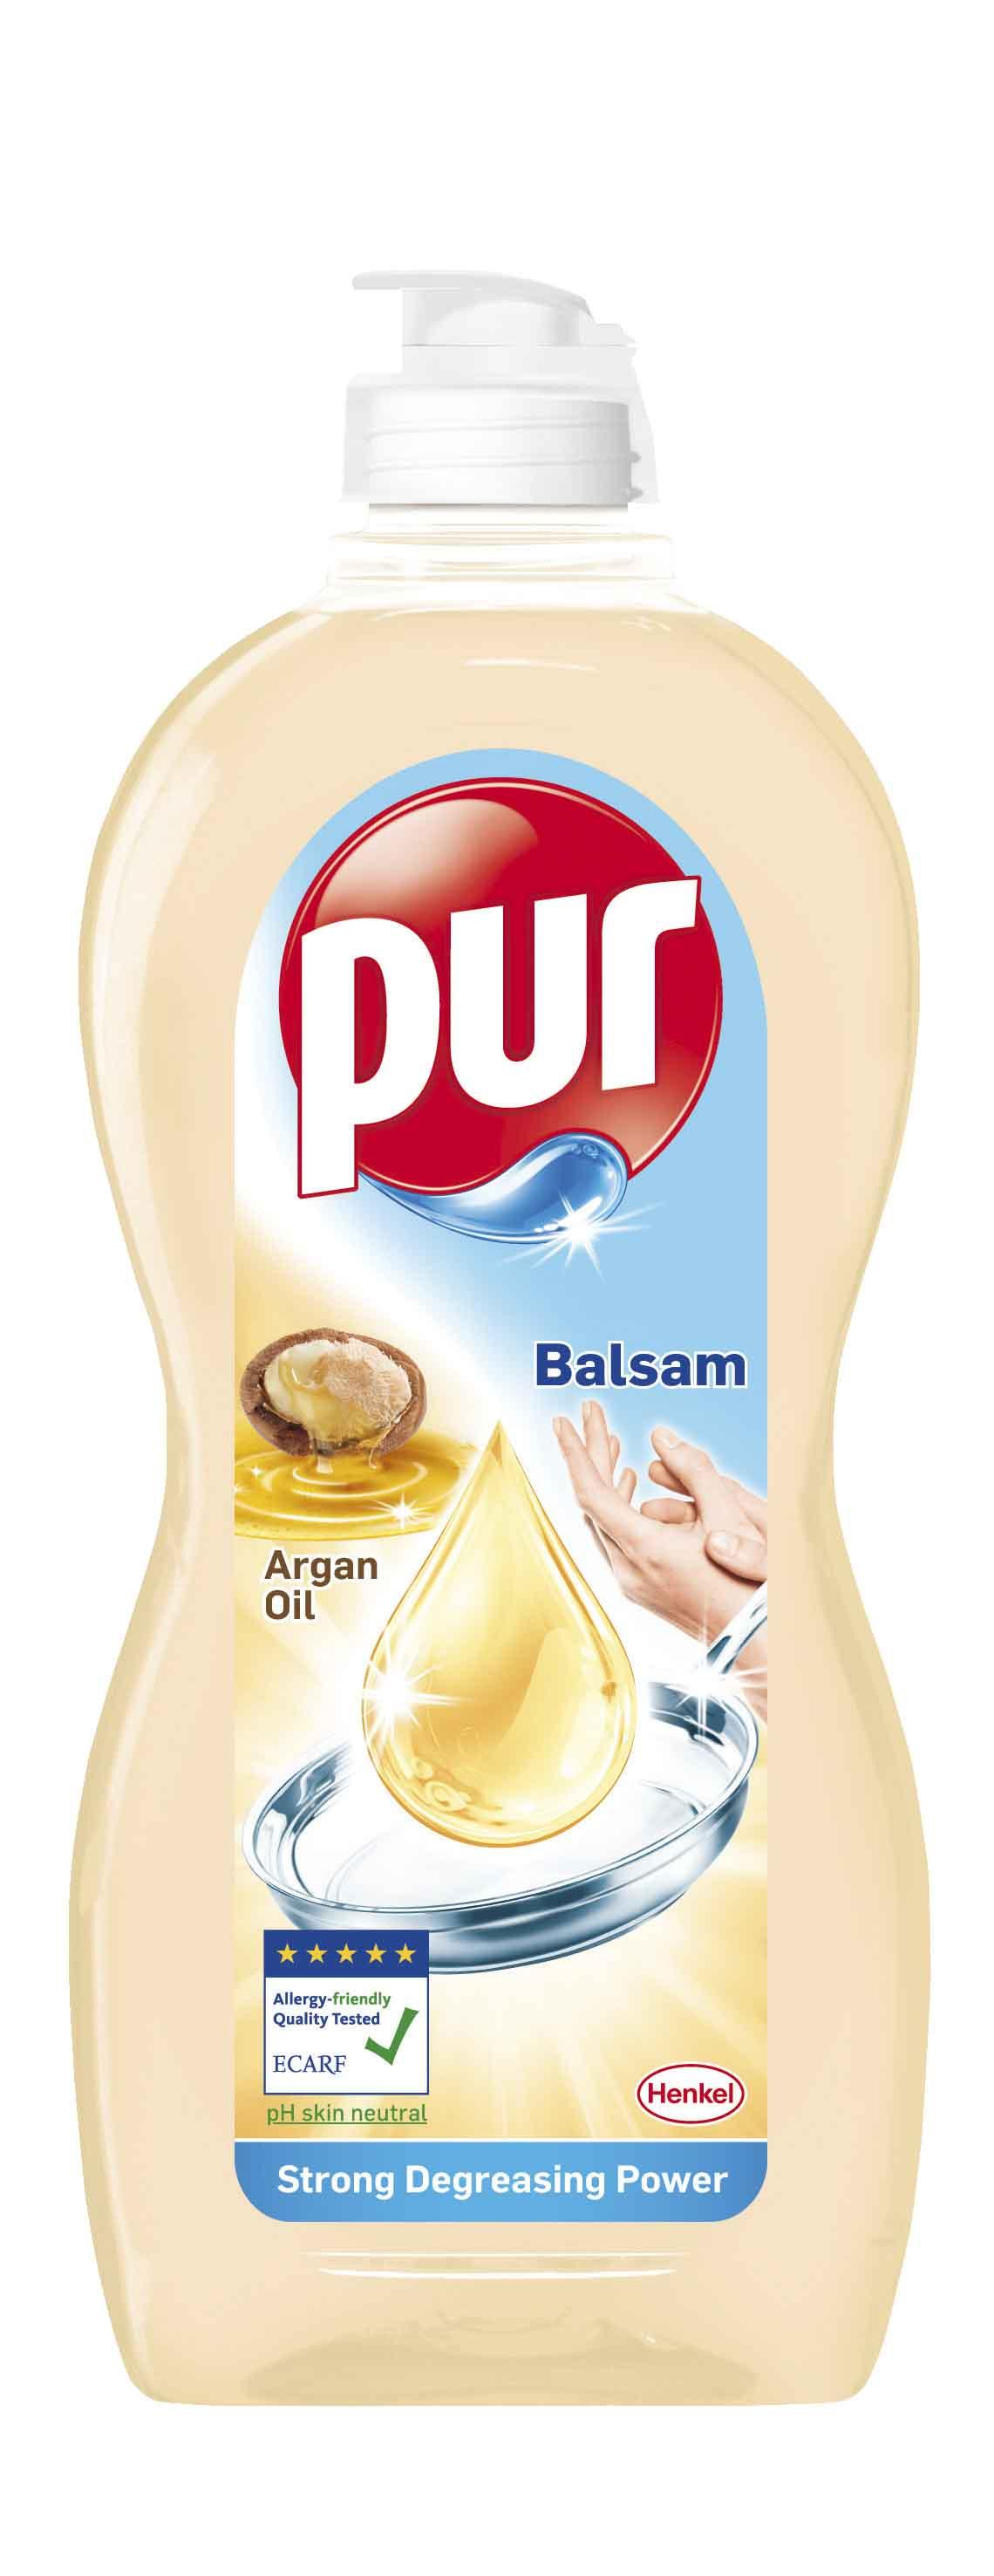 Fotografie Pur Balsam Argan Oil prostředek na mytí nádobí 450 ml